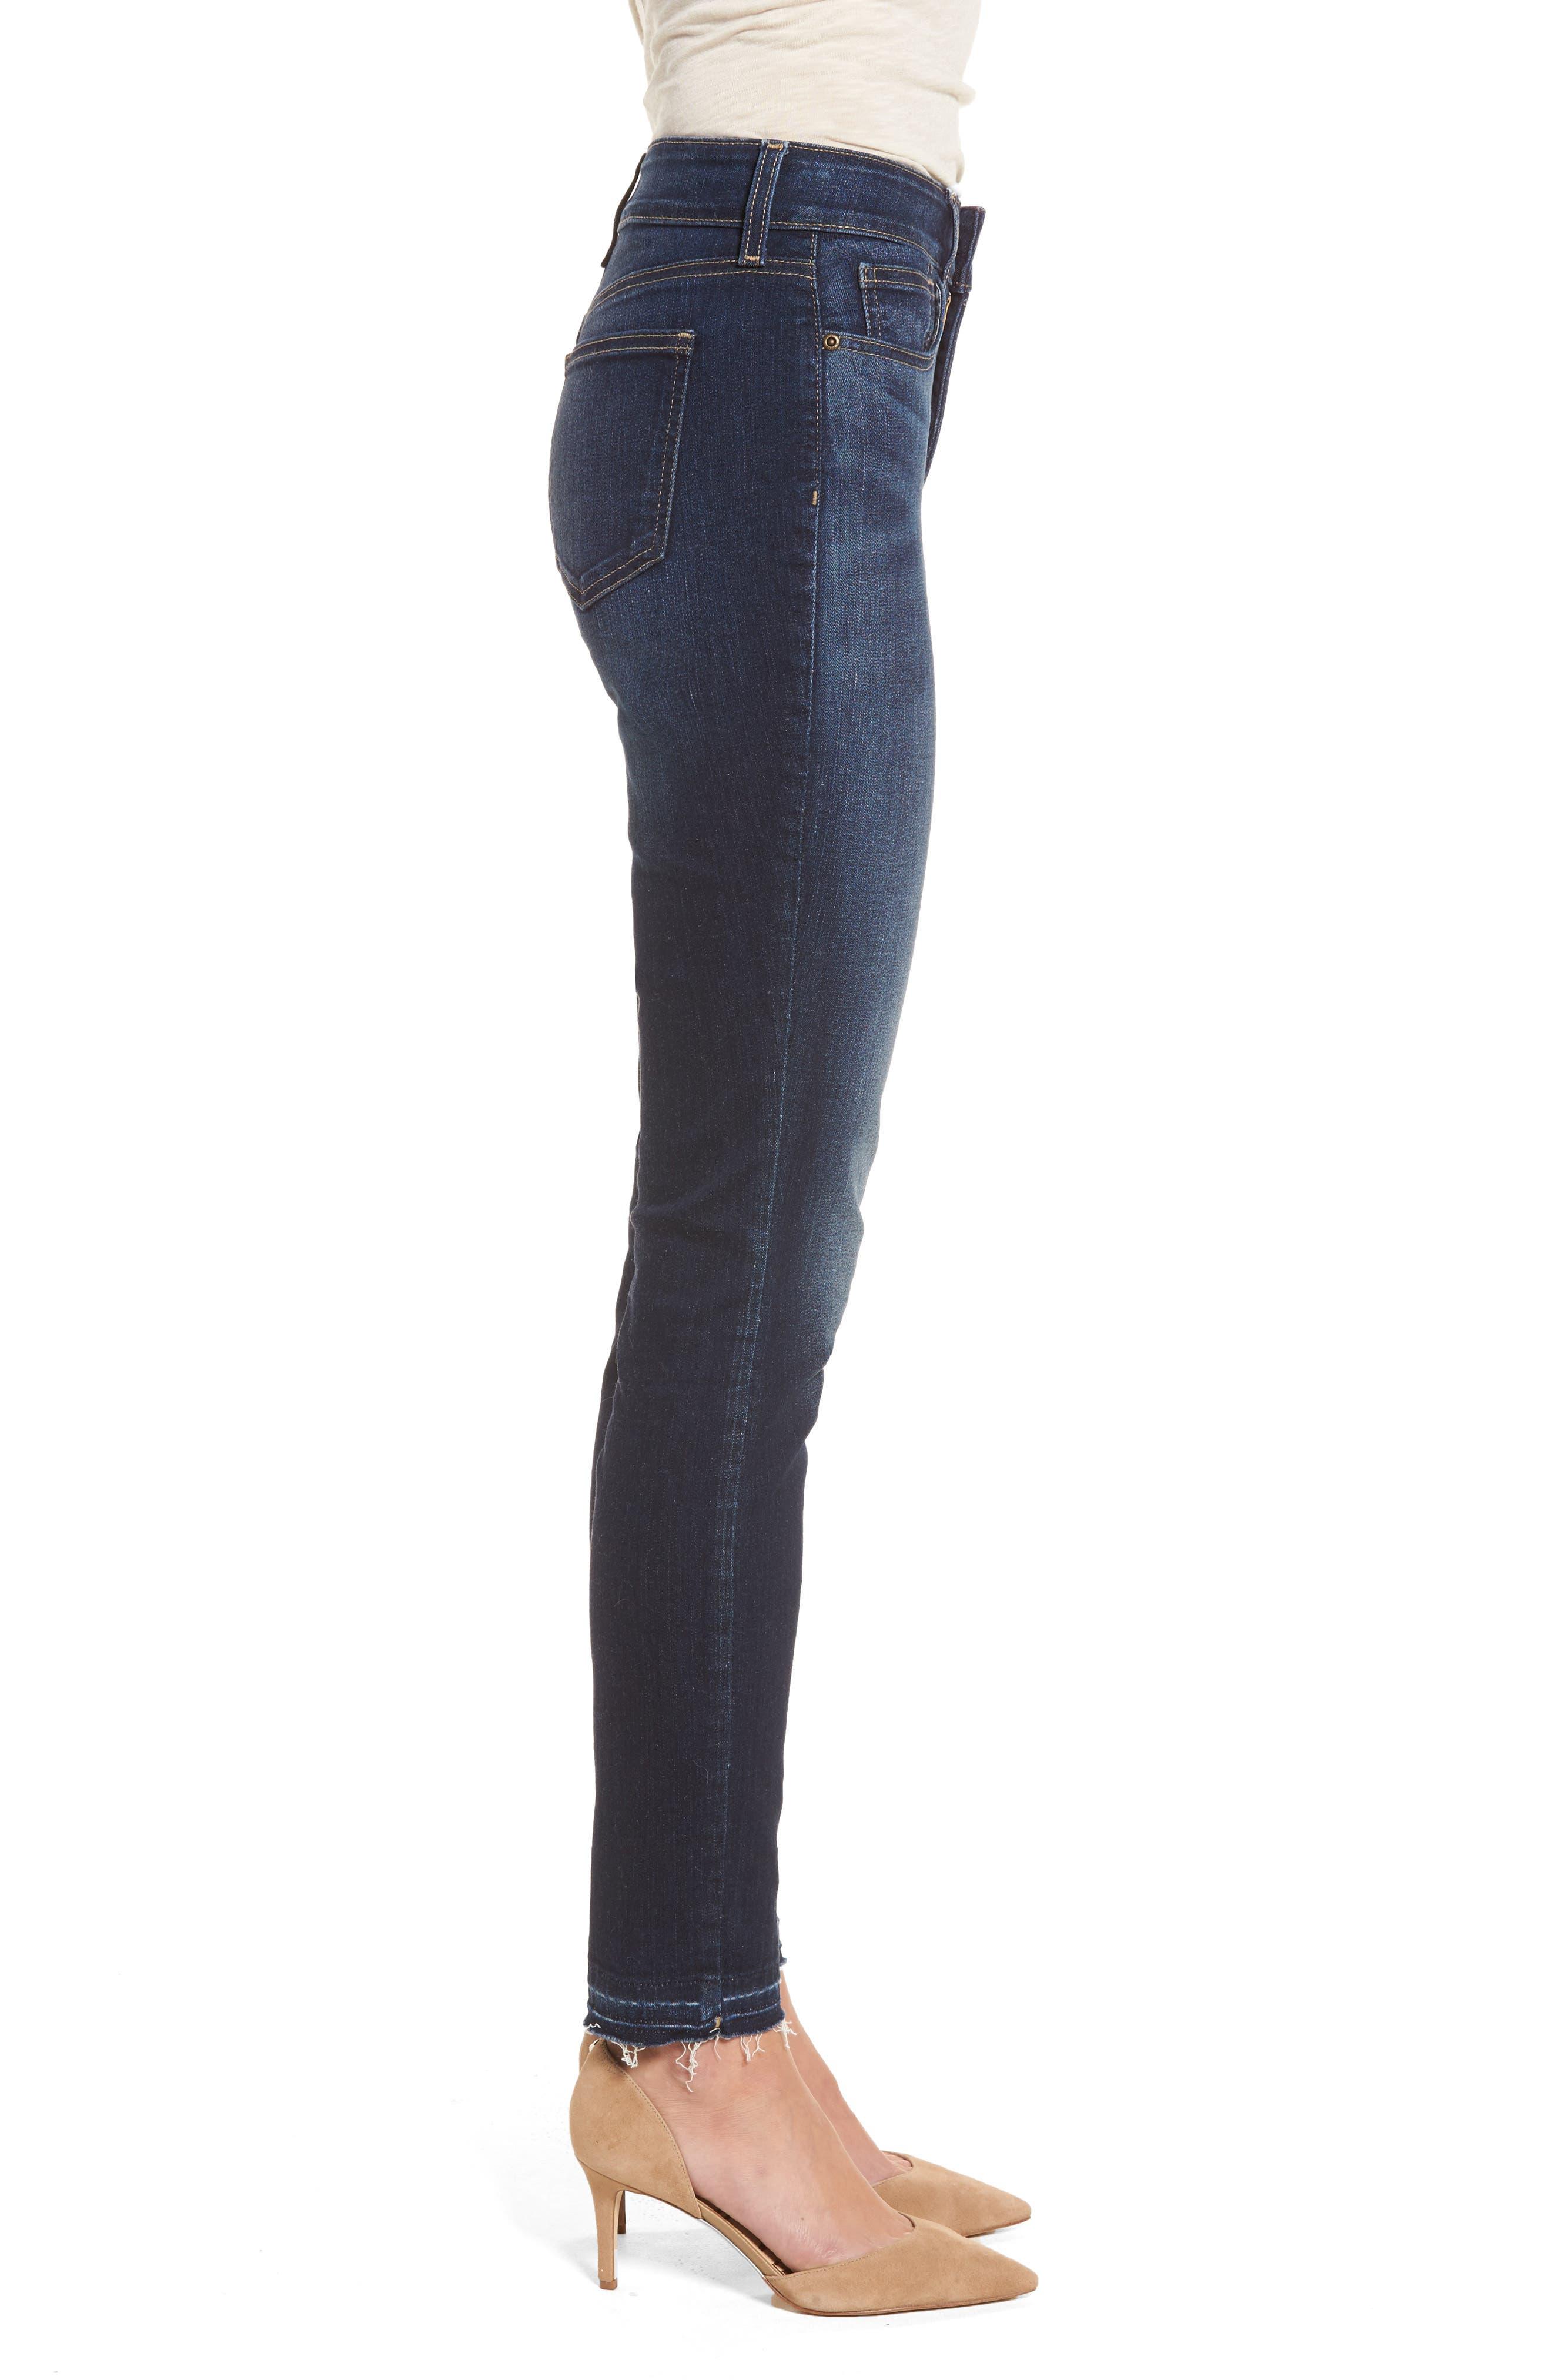 Alina Release Hem Stretch Ankle Jeans,                             Alternate thumbnail 4, color,                             Bezel